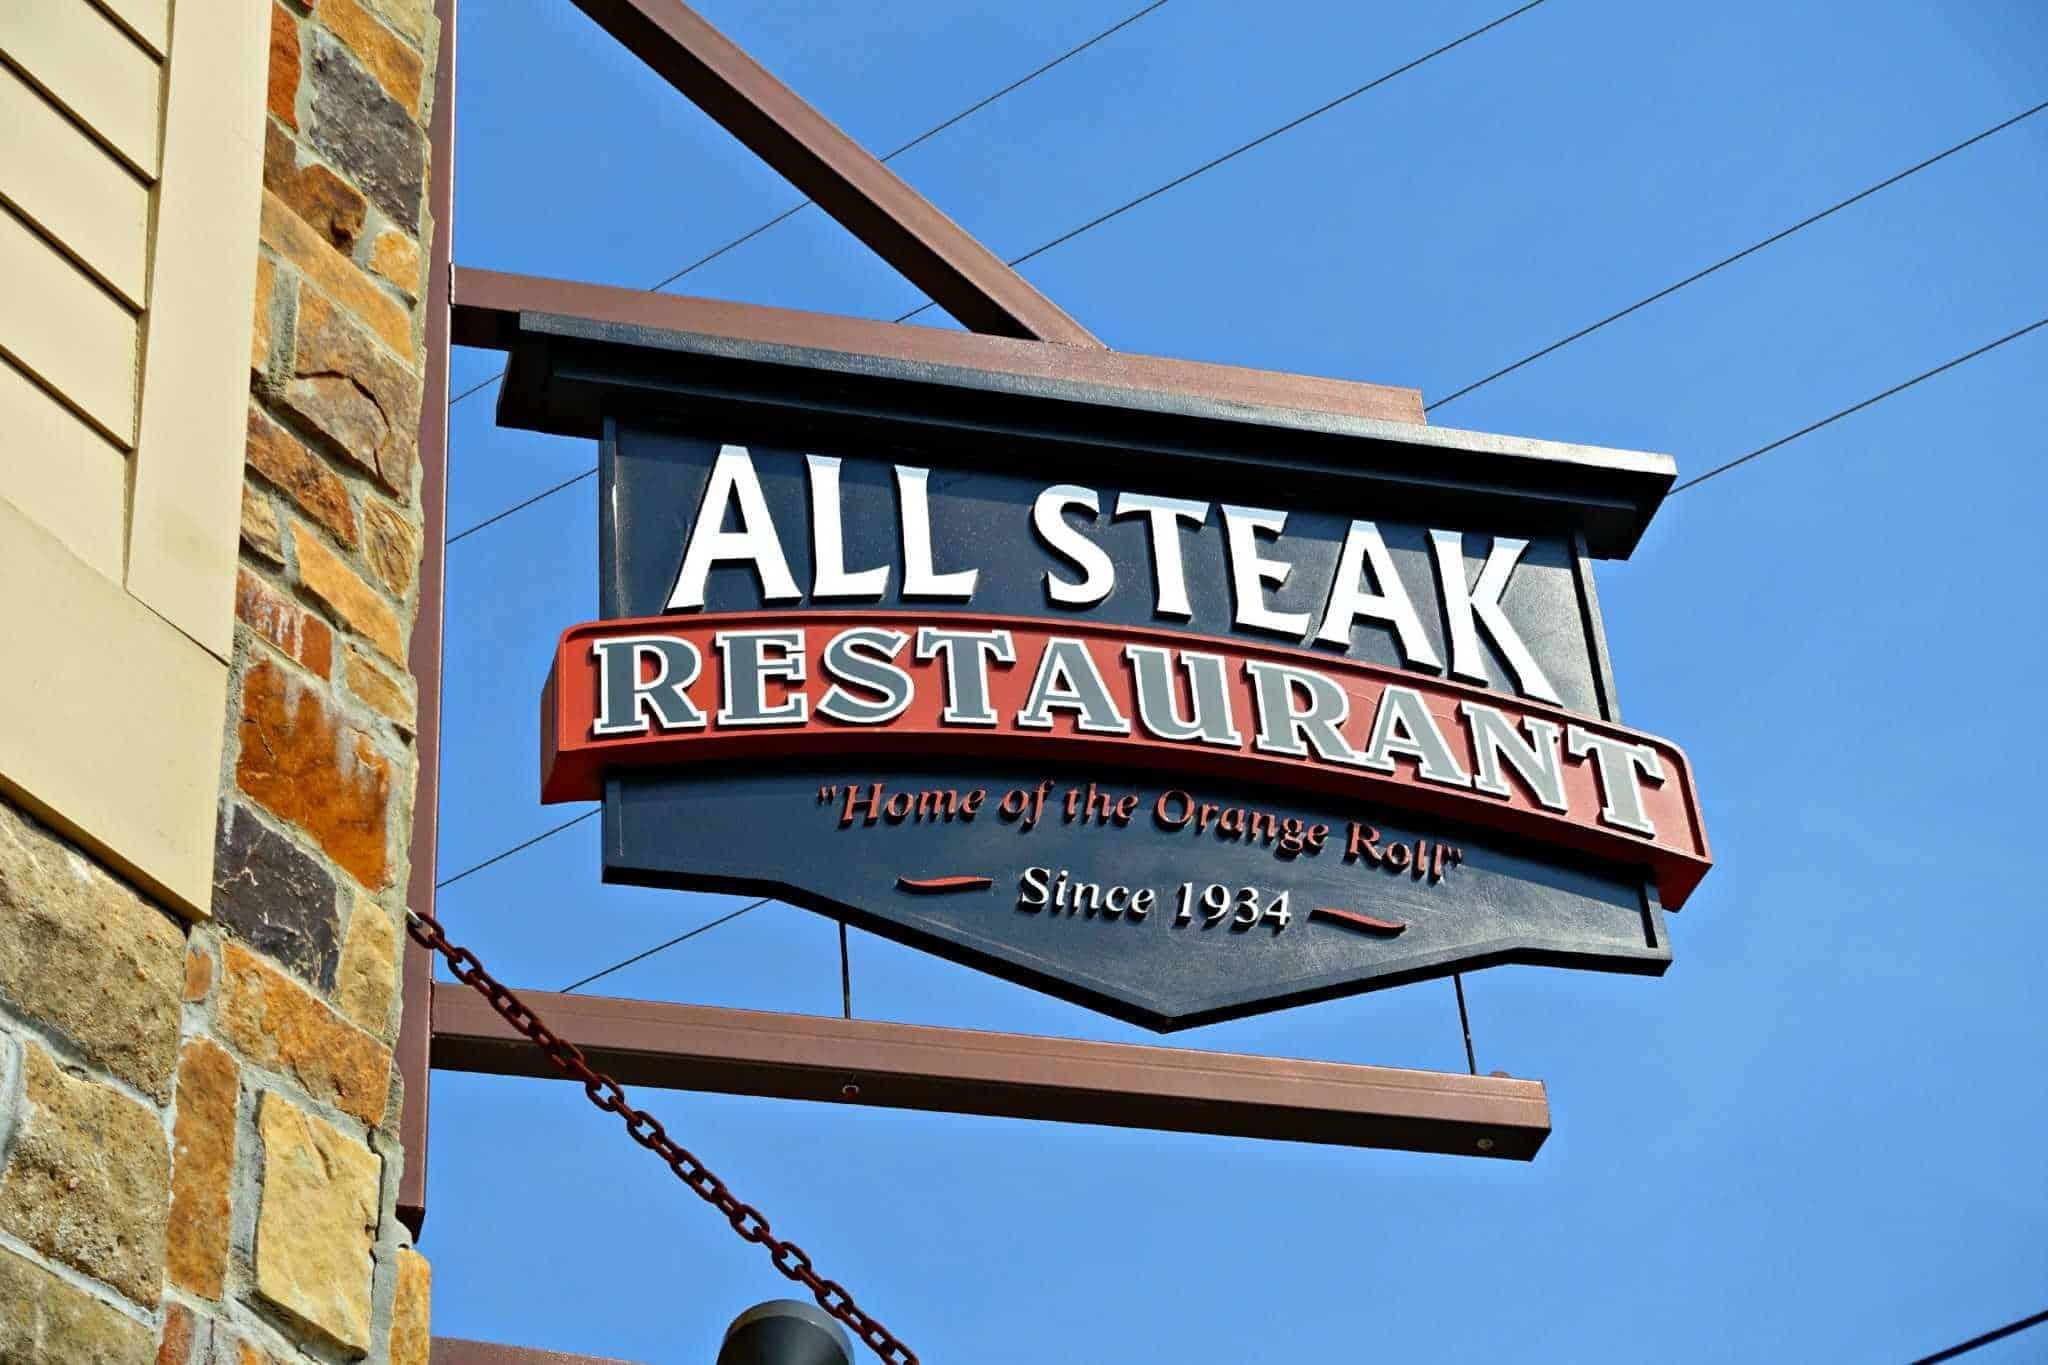 All Steak Restaurant in Cullman, Alabama